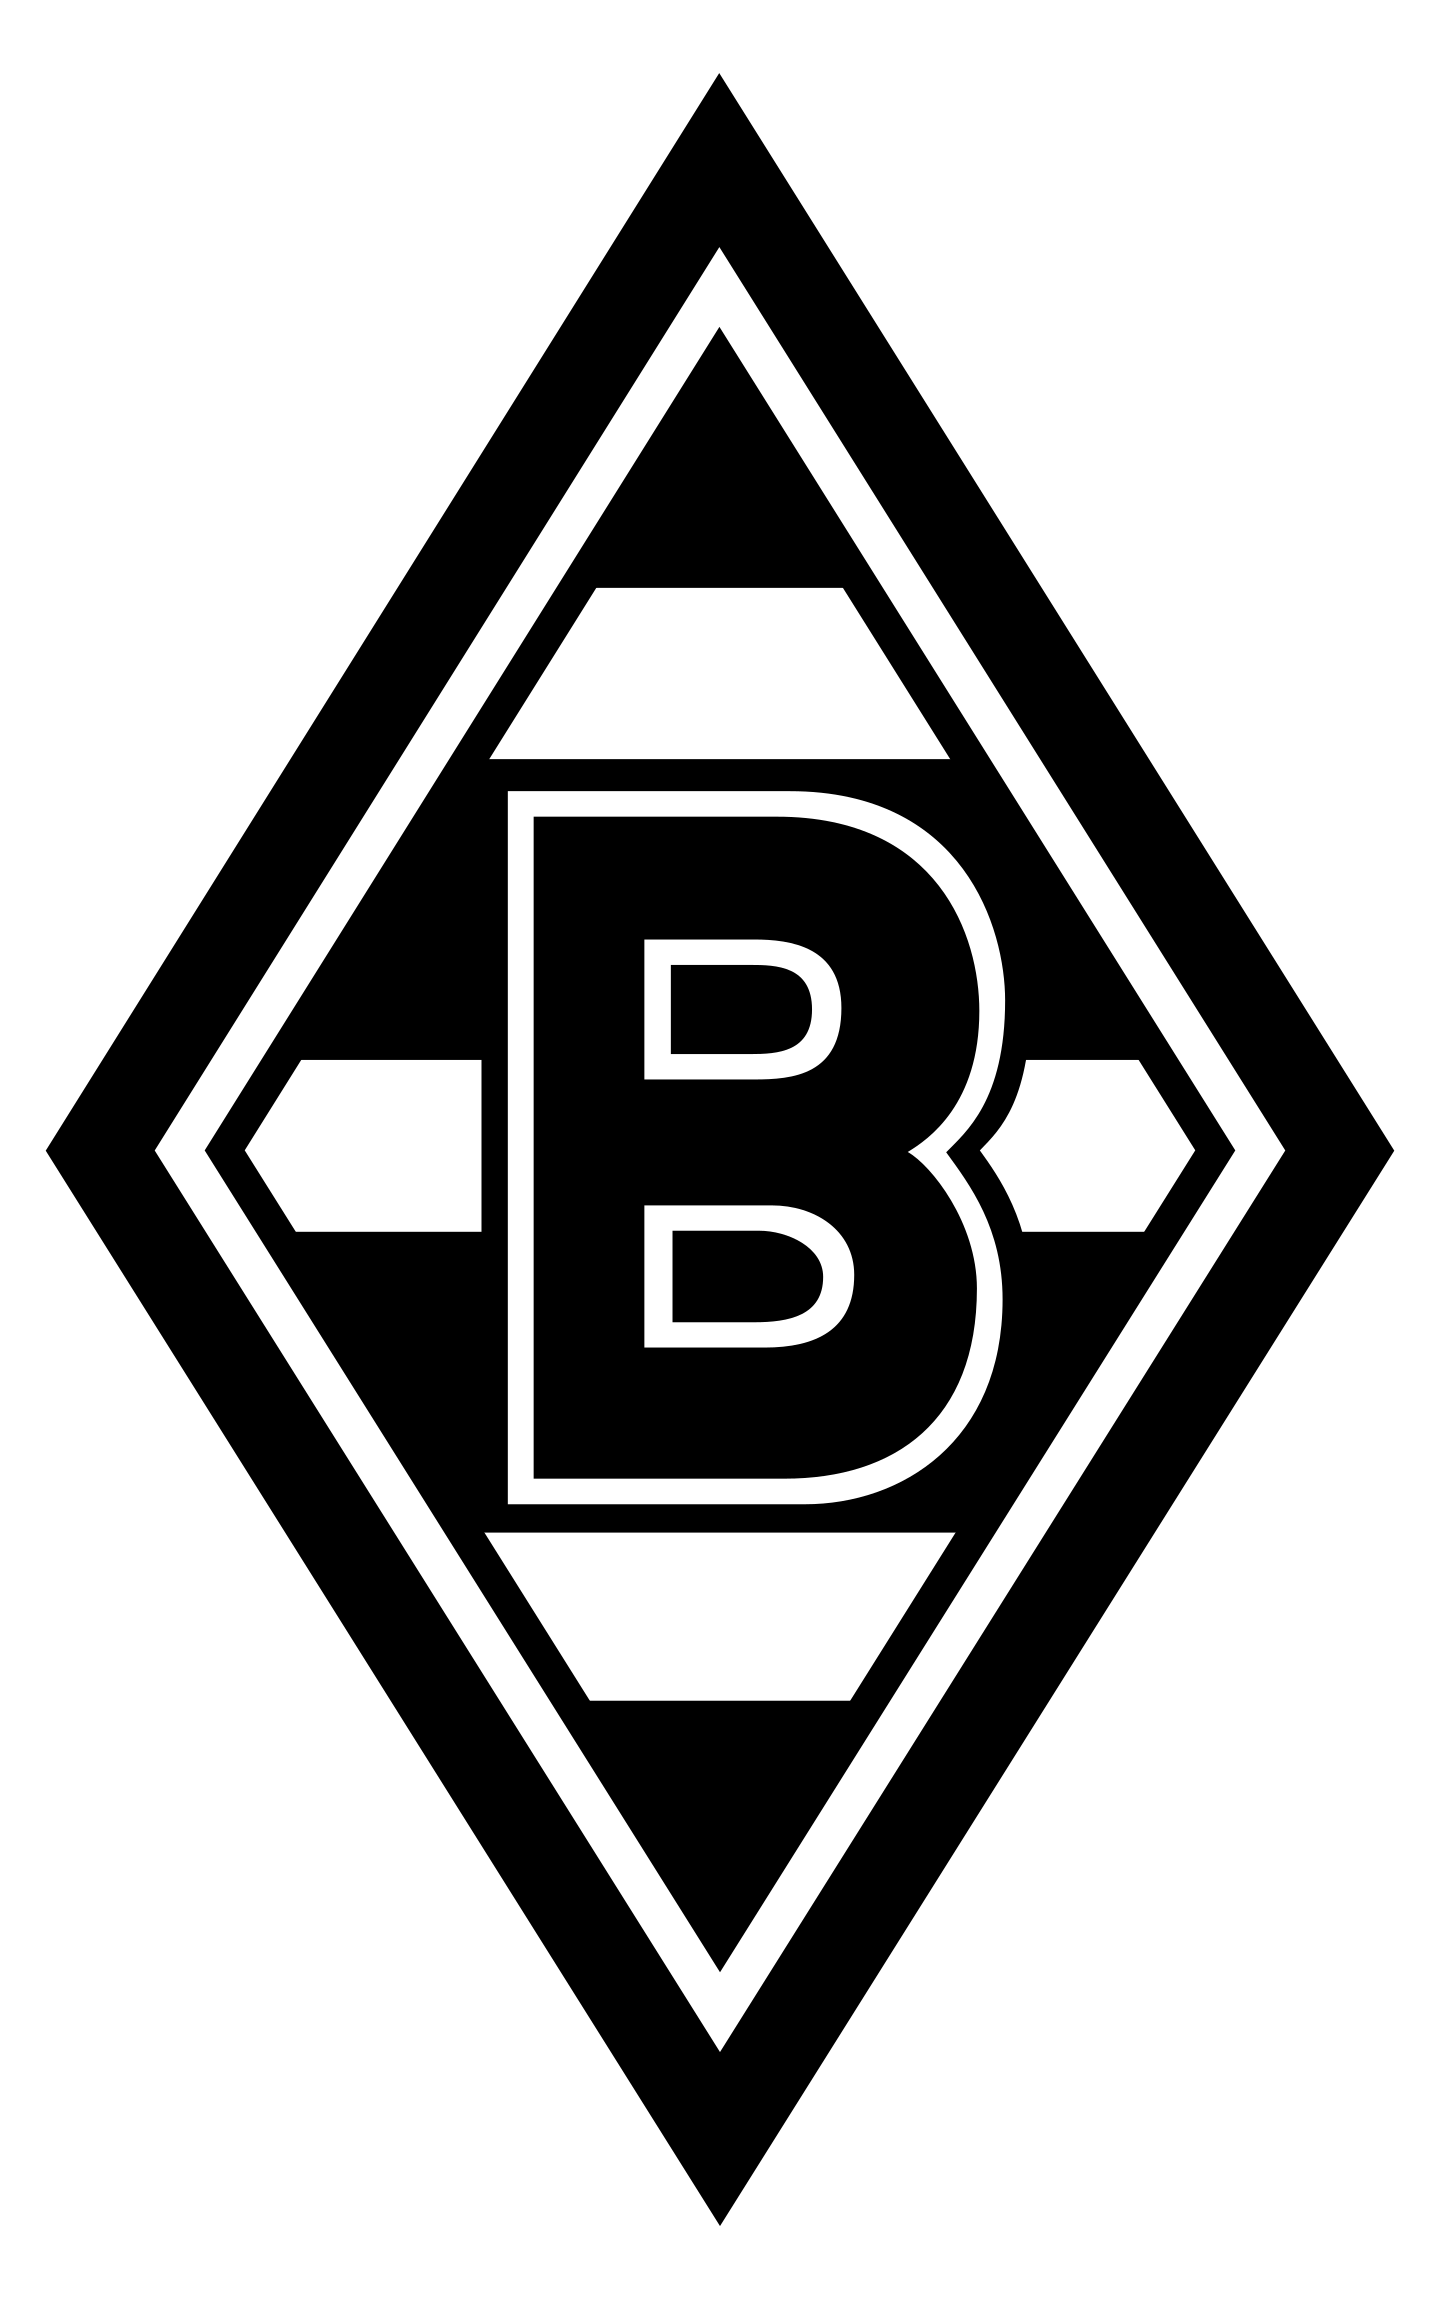 borussia monchengladbach logo 2 - Borussia Mönchengladbach Logo